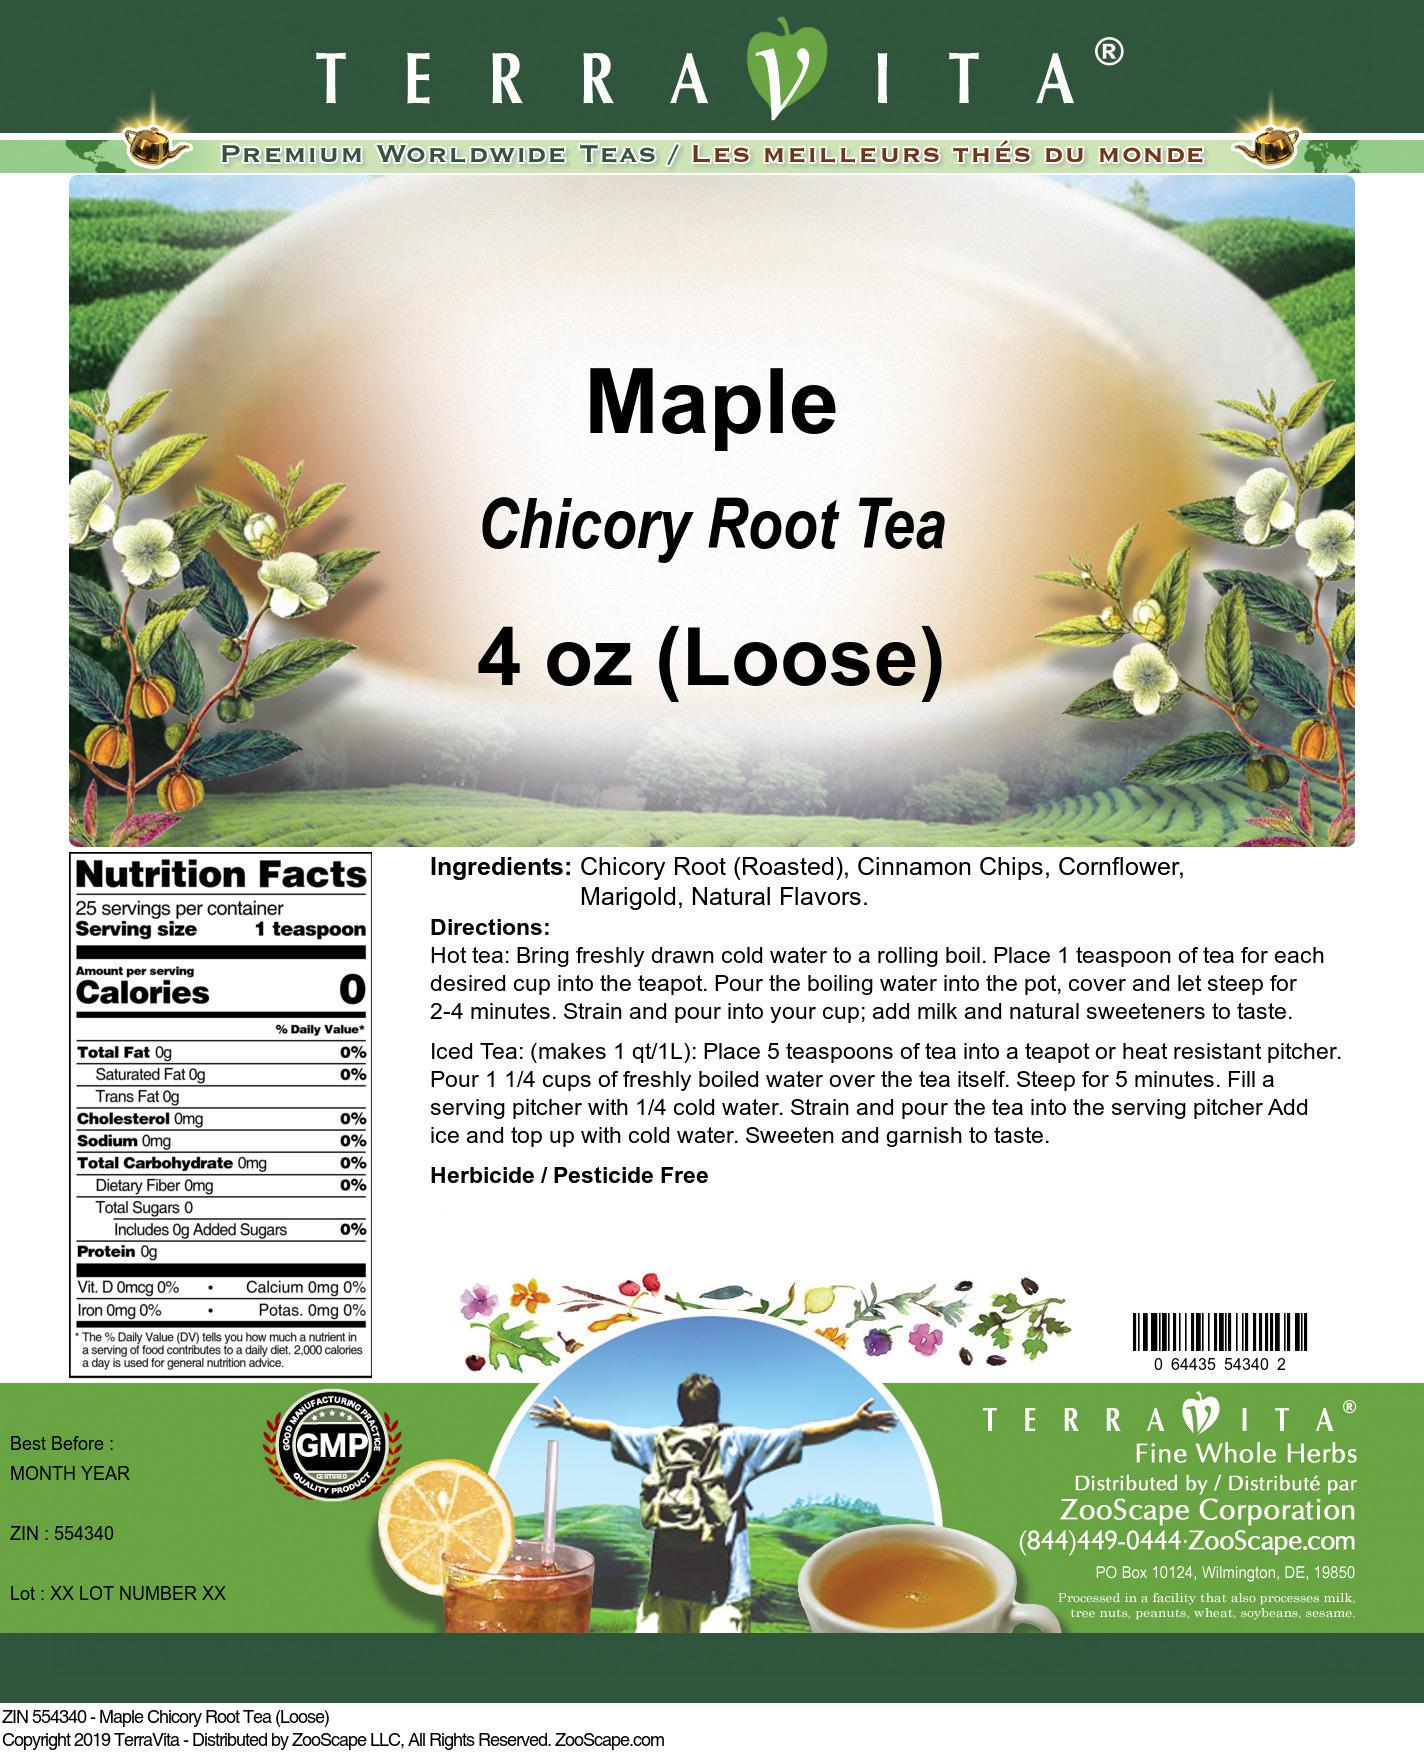 Maple Chicory Root Tea (Loose)